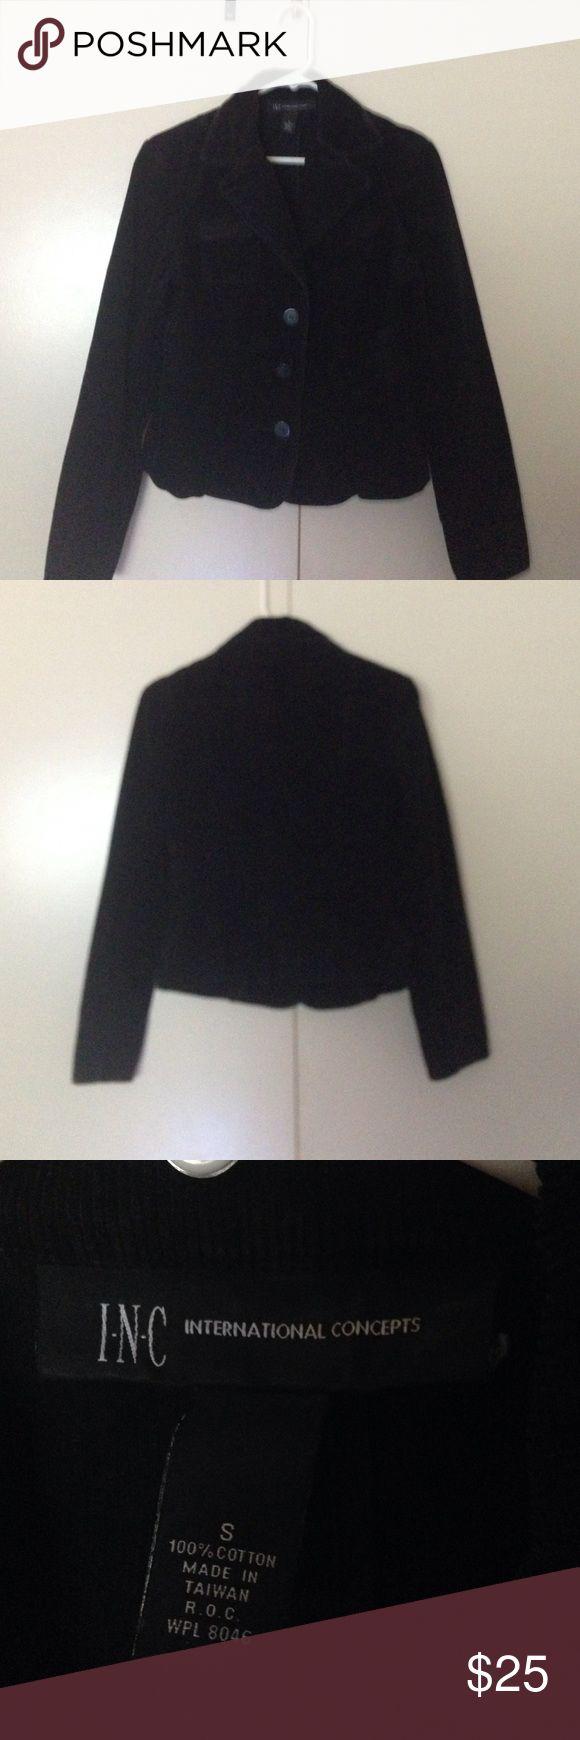 INC International Concepts Black Corduroy Jacket Macy's INC International Concepts black corduroy jacket. 100% cotton. Imported. INC International Concepts Jackets & Coats Jean Jackets